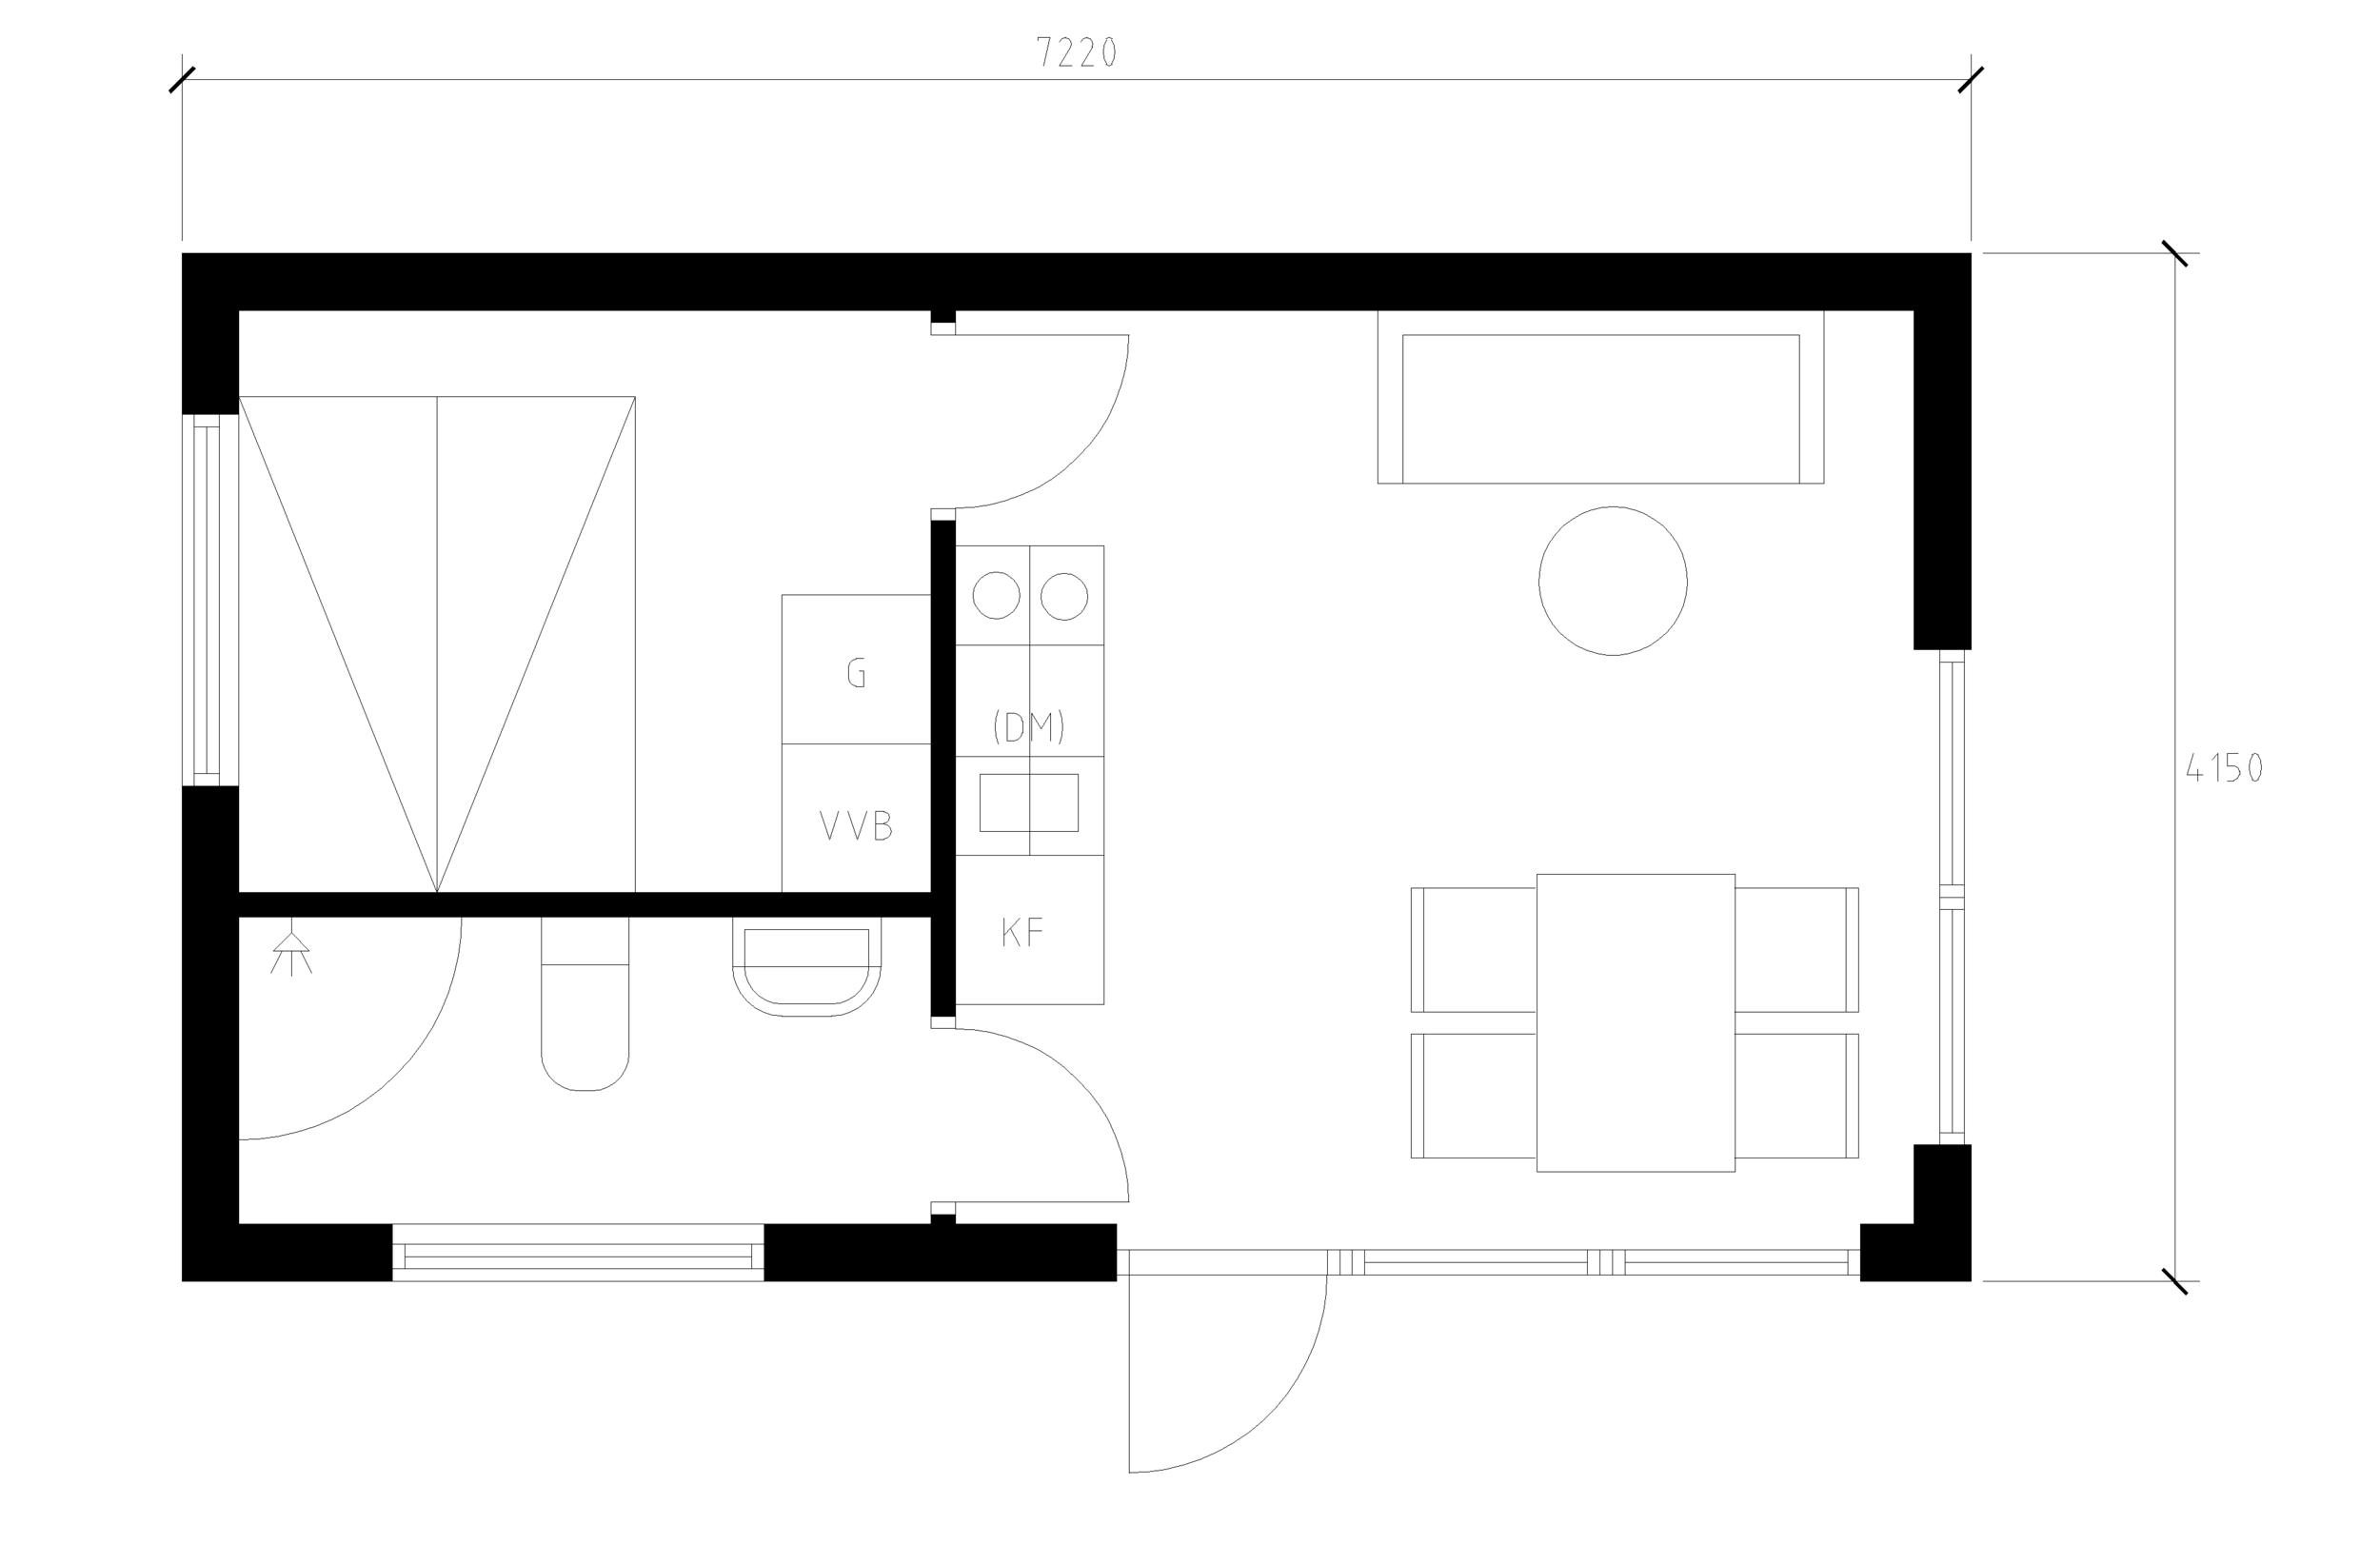 easy-house-fritidshus-30-planritning.png